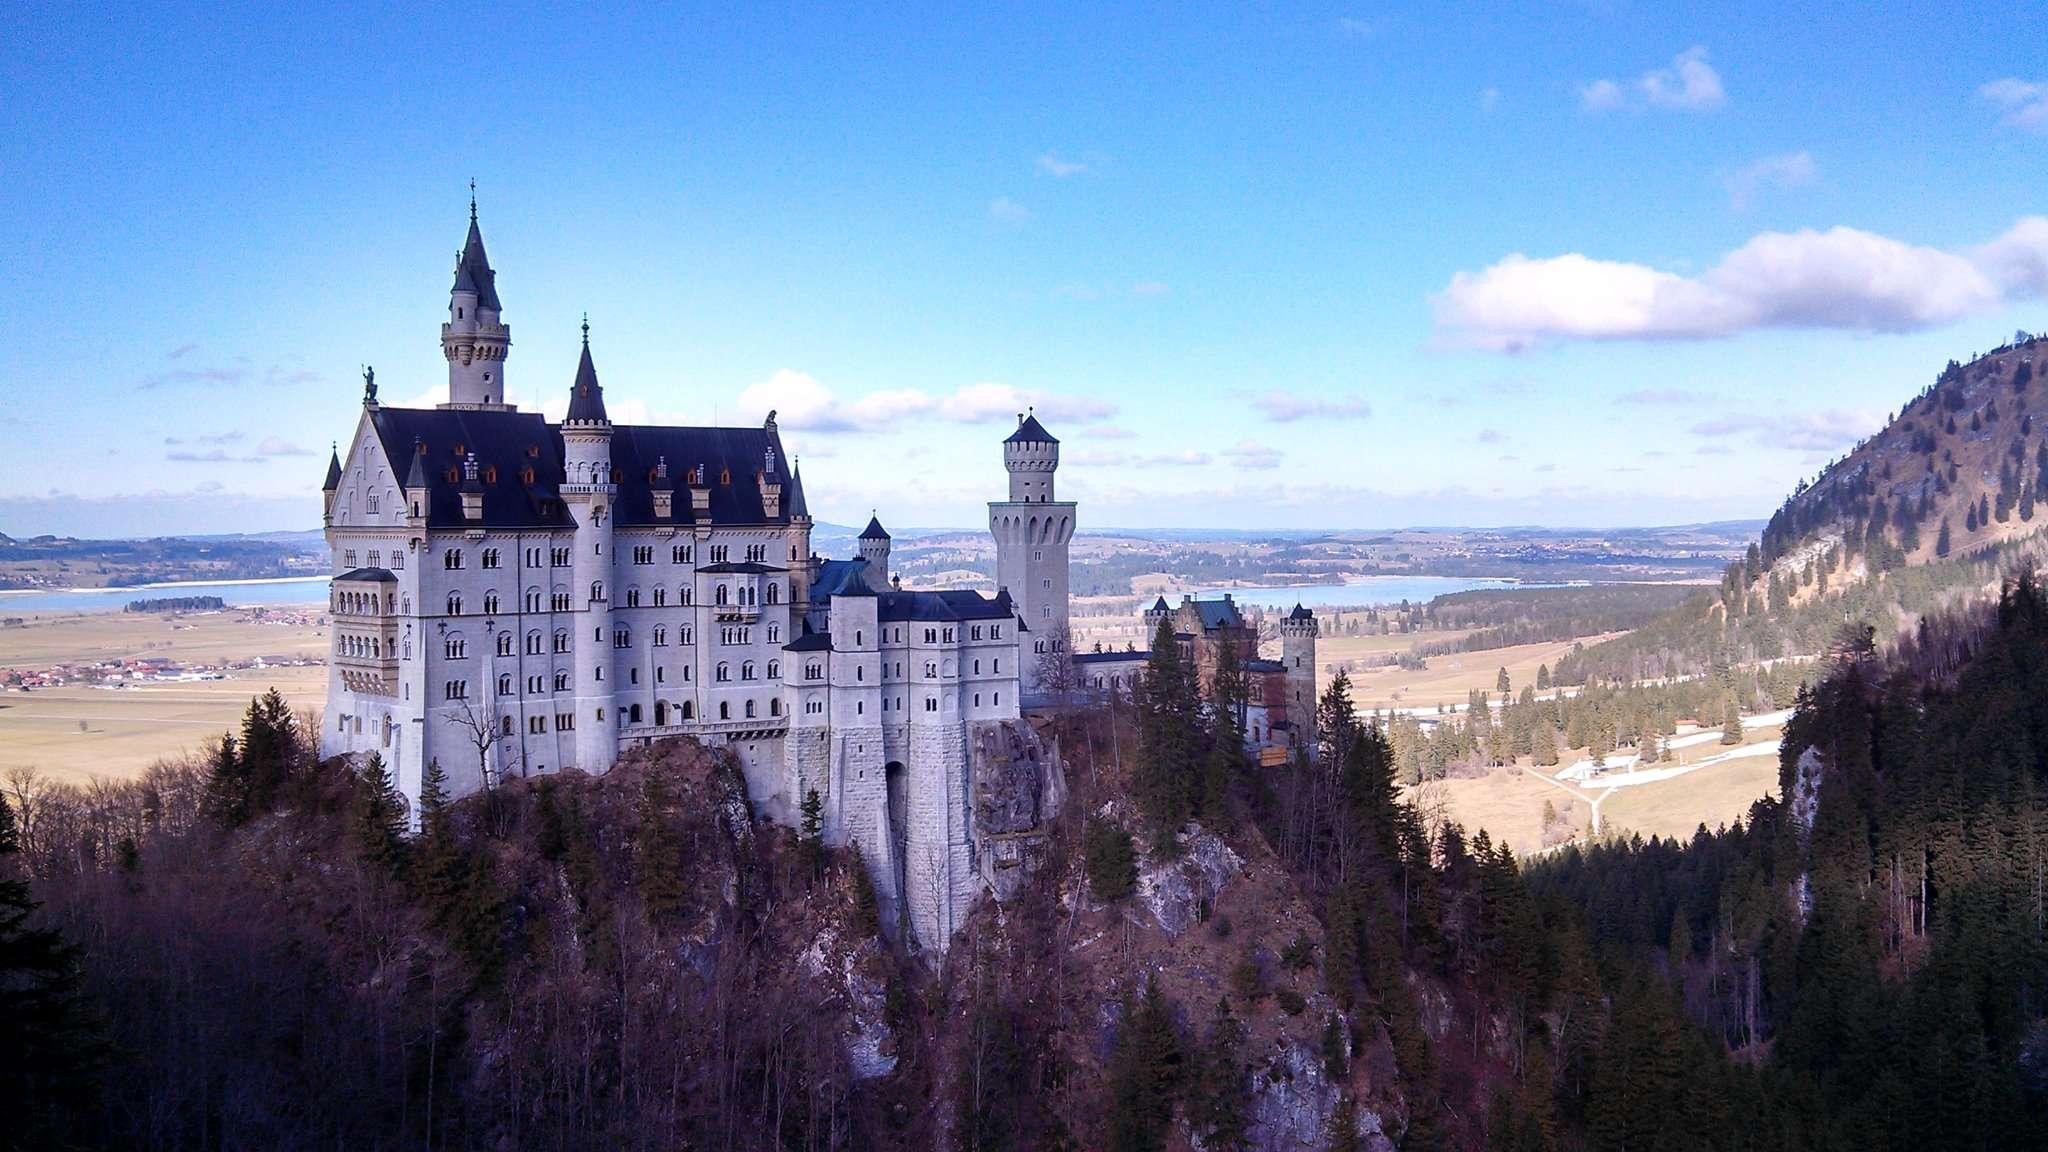 Château Neuschwanstein - 7 châteaux à visiter absolument lors de ton prochain Eurotrip - Nomad Junkies